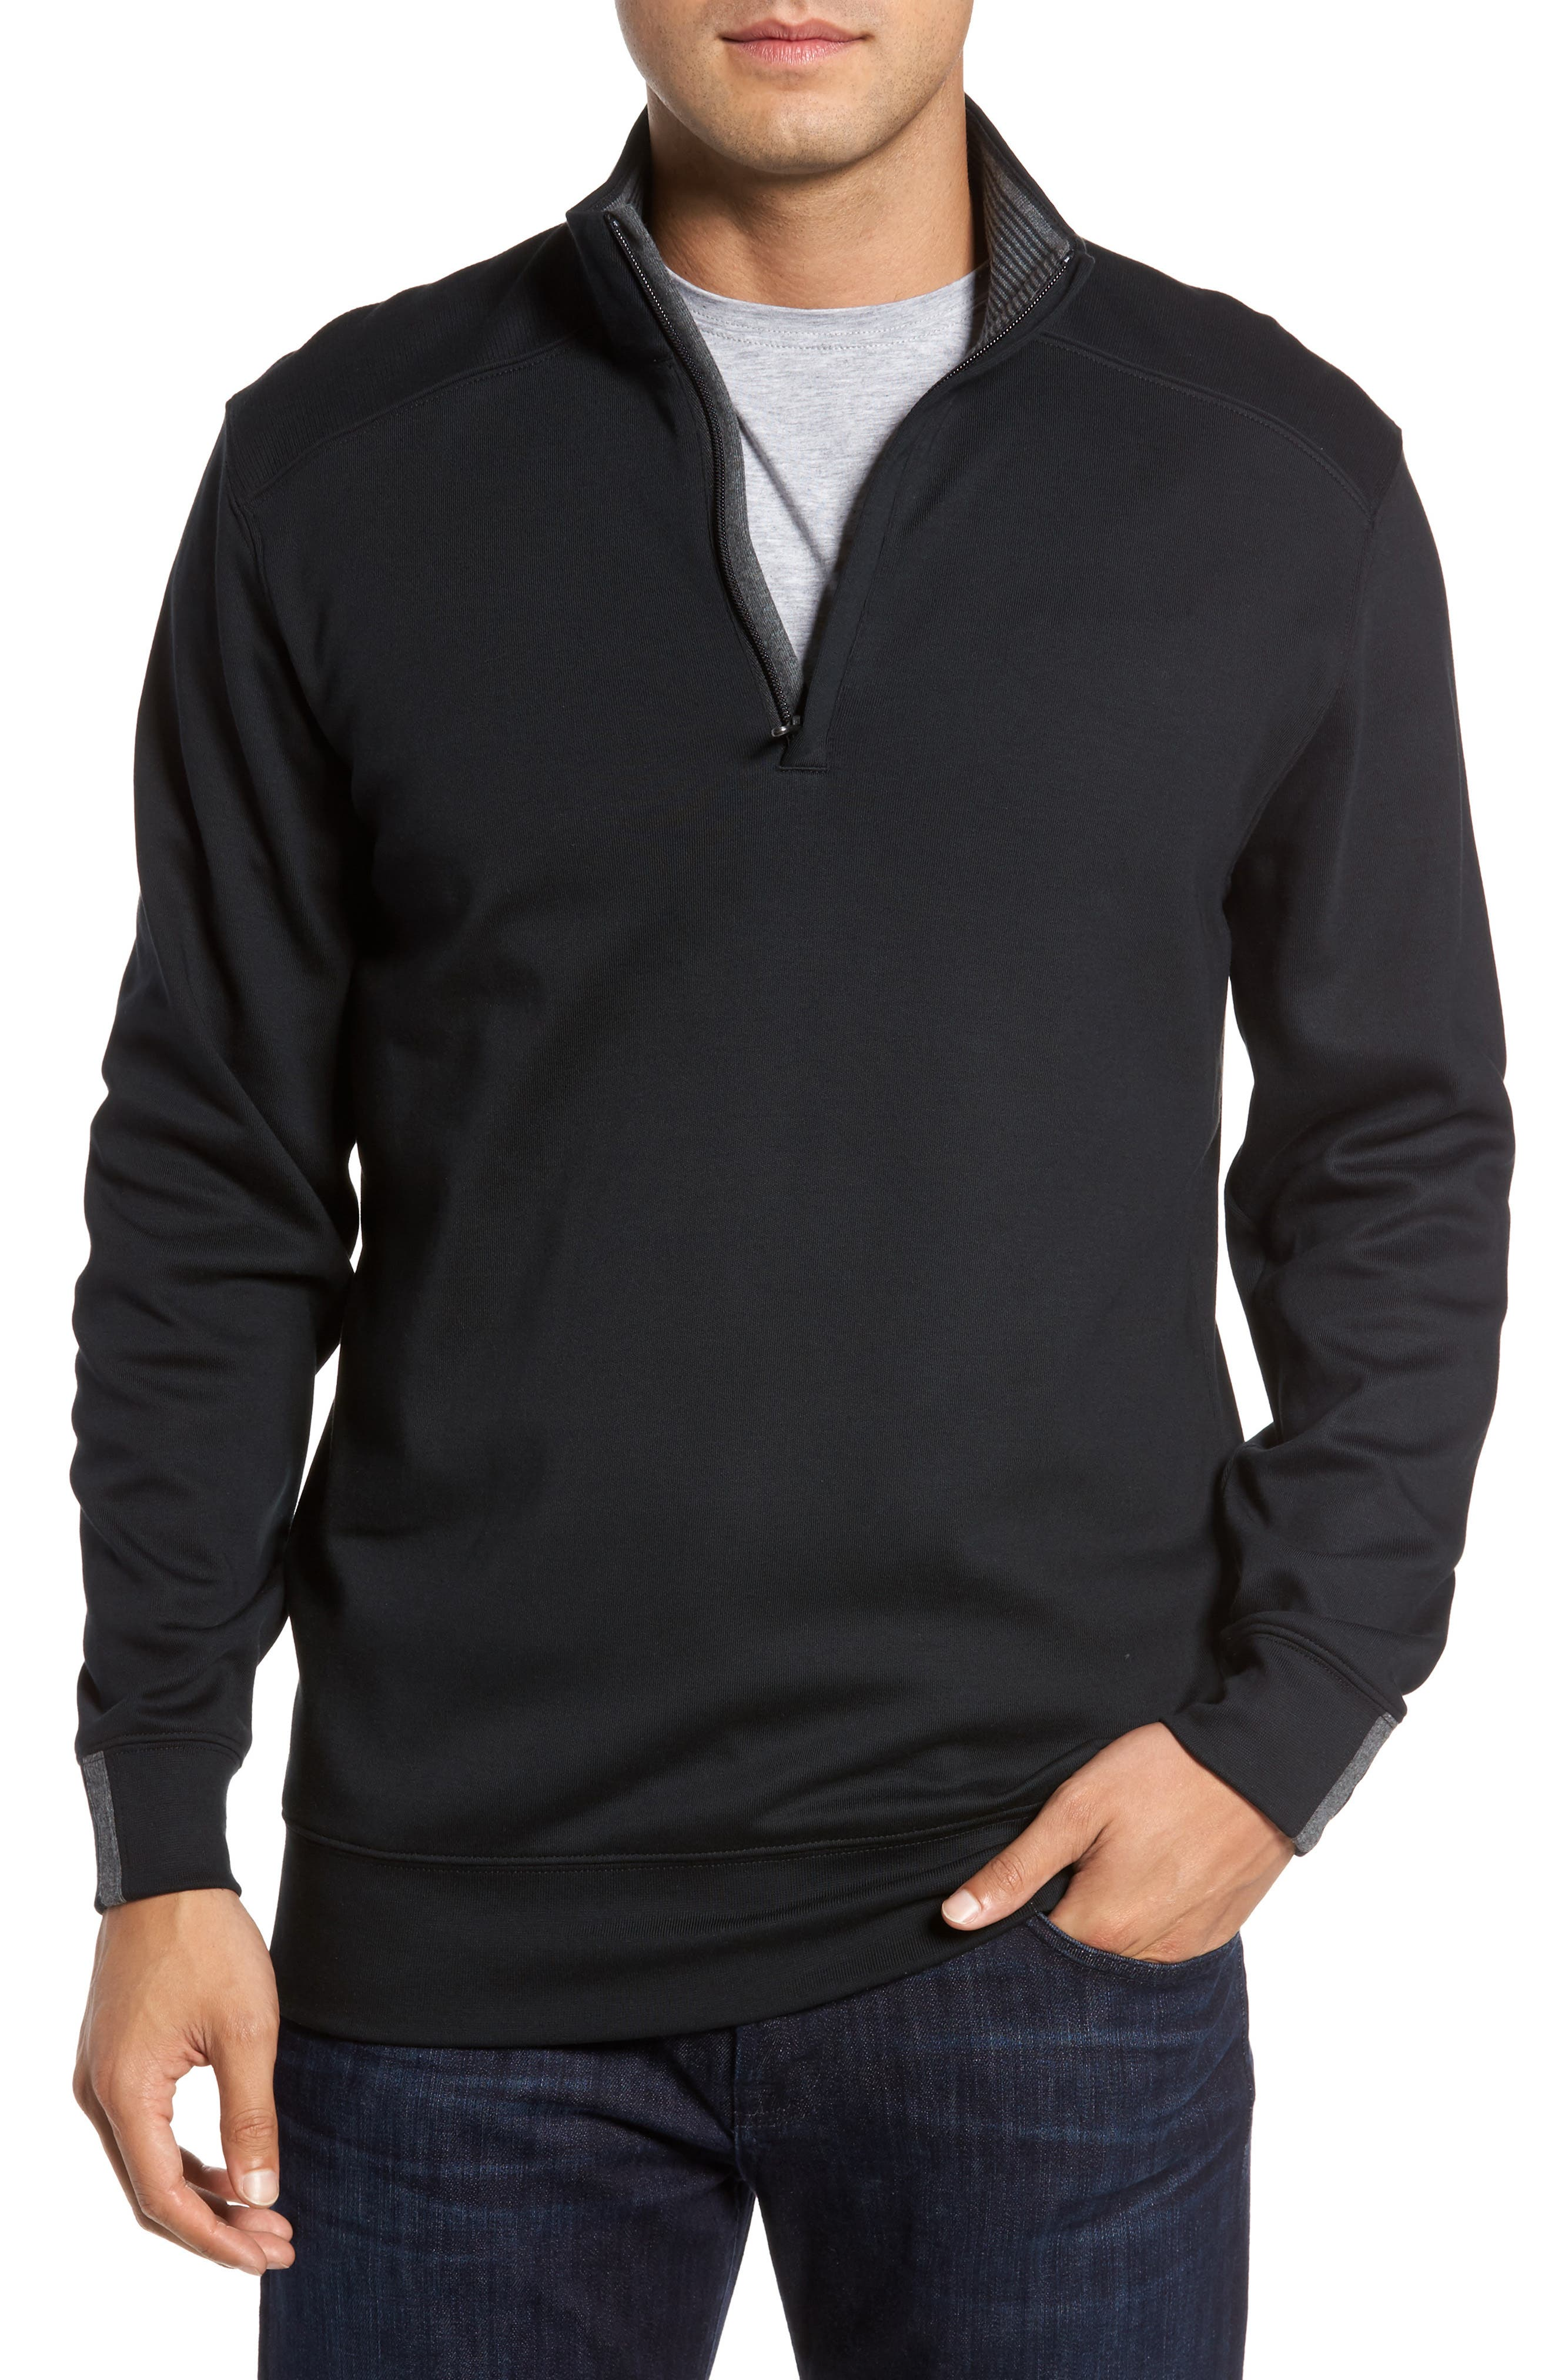 Bobby Jones 'New Leaderboard' Quarter Zip Pullover